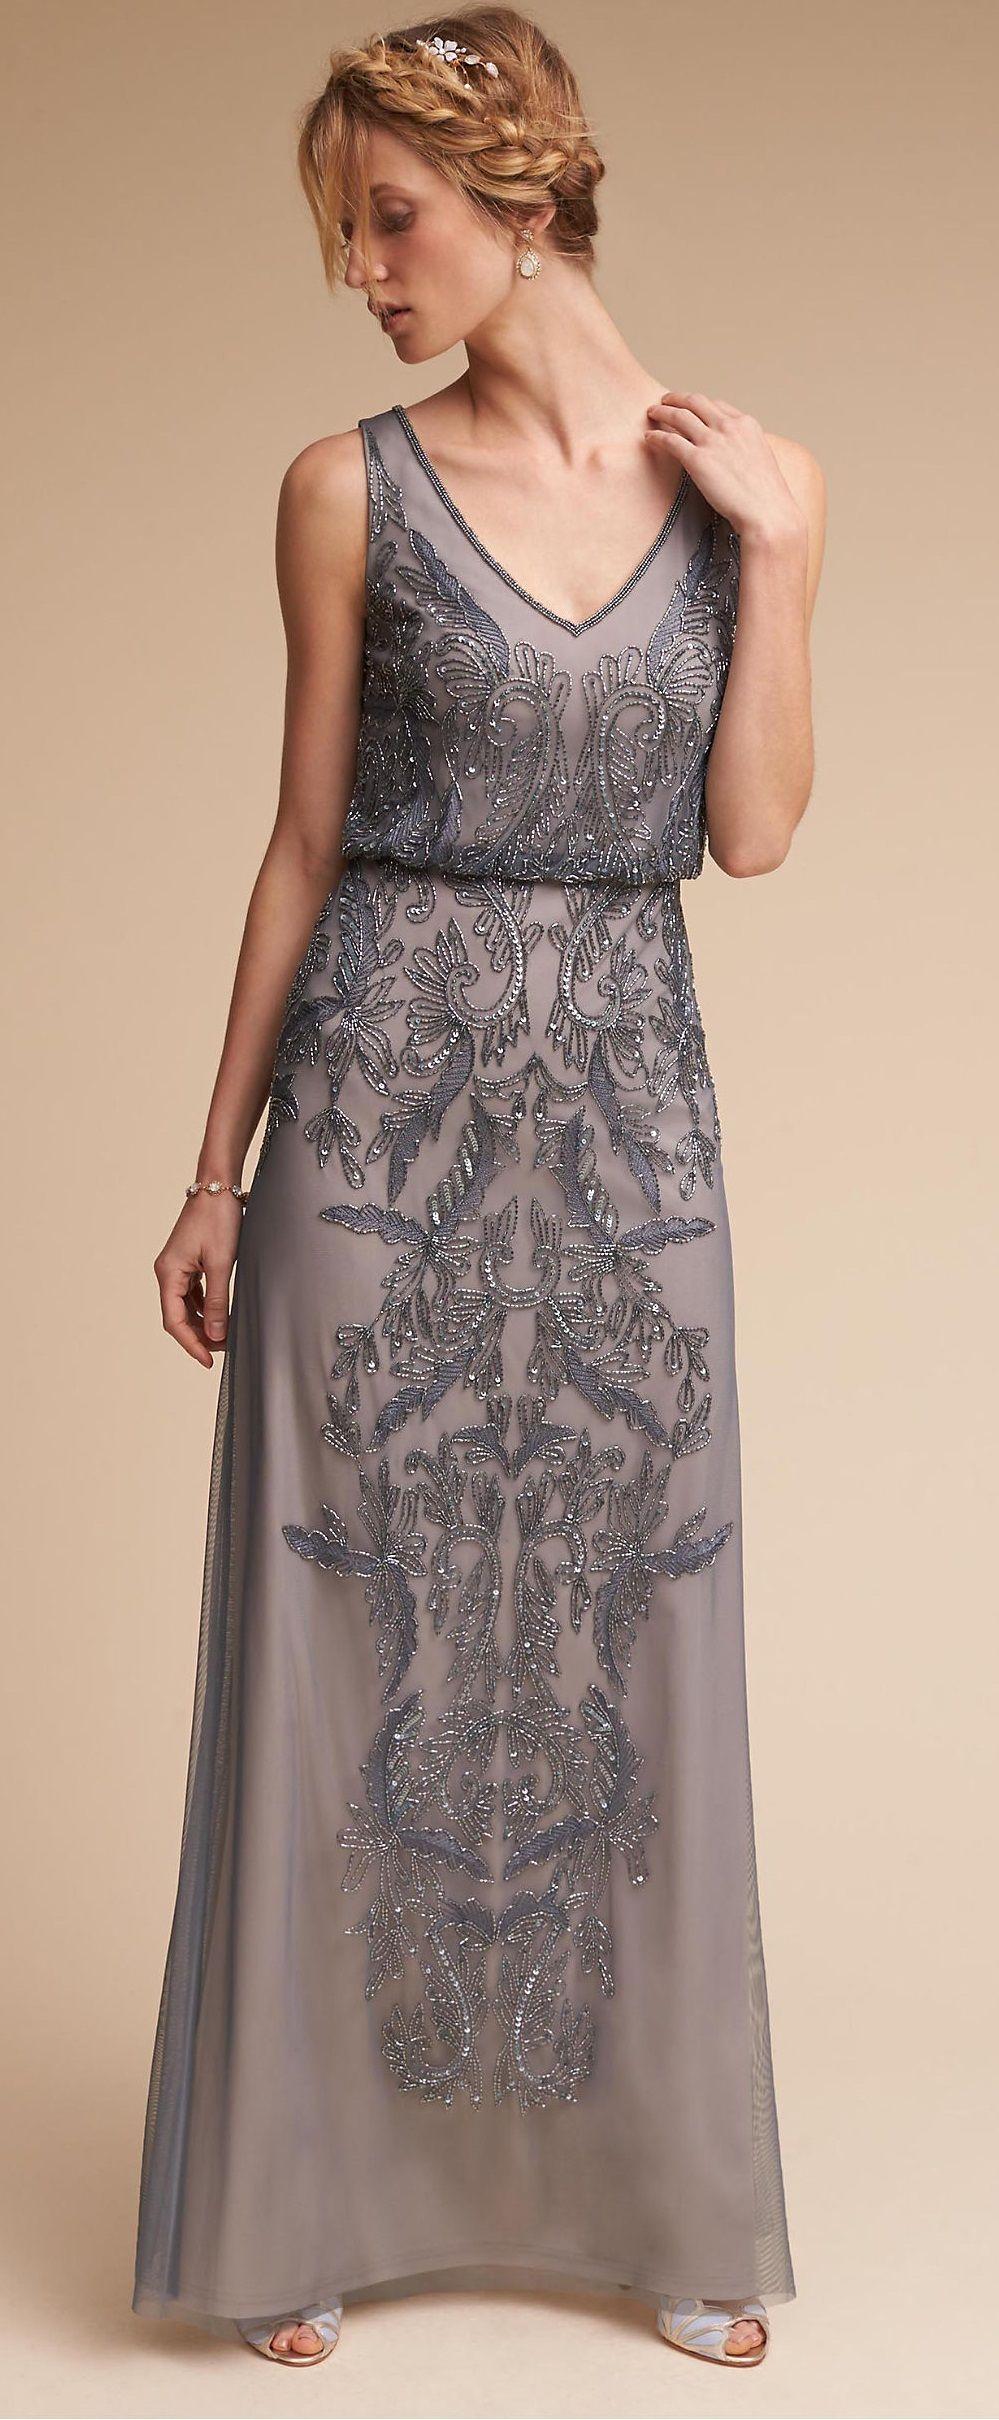 Beautifully embellished bridesmaid dress dresses pinterest